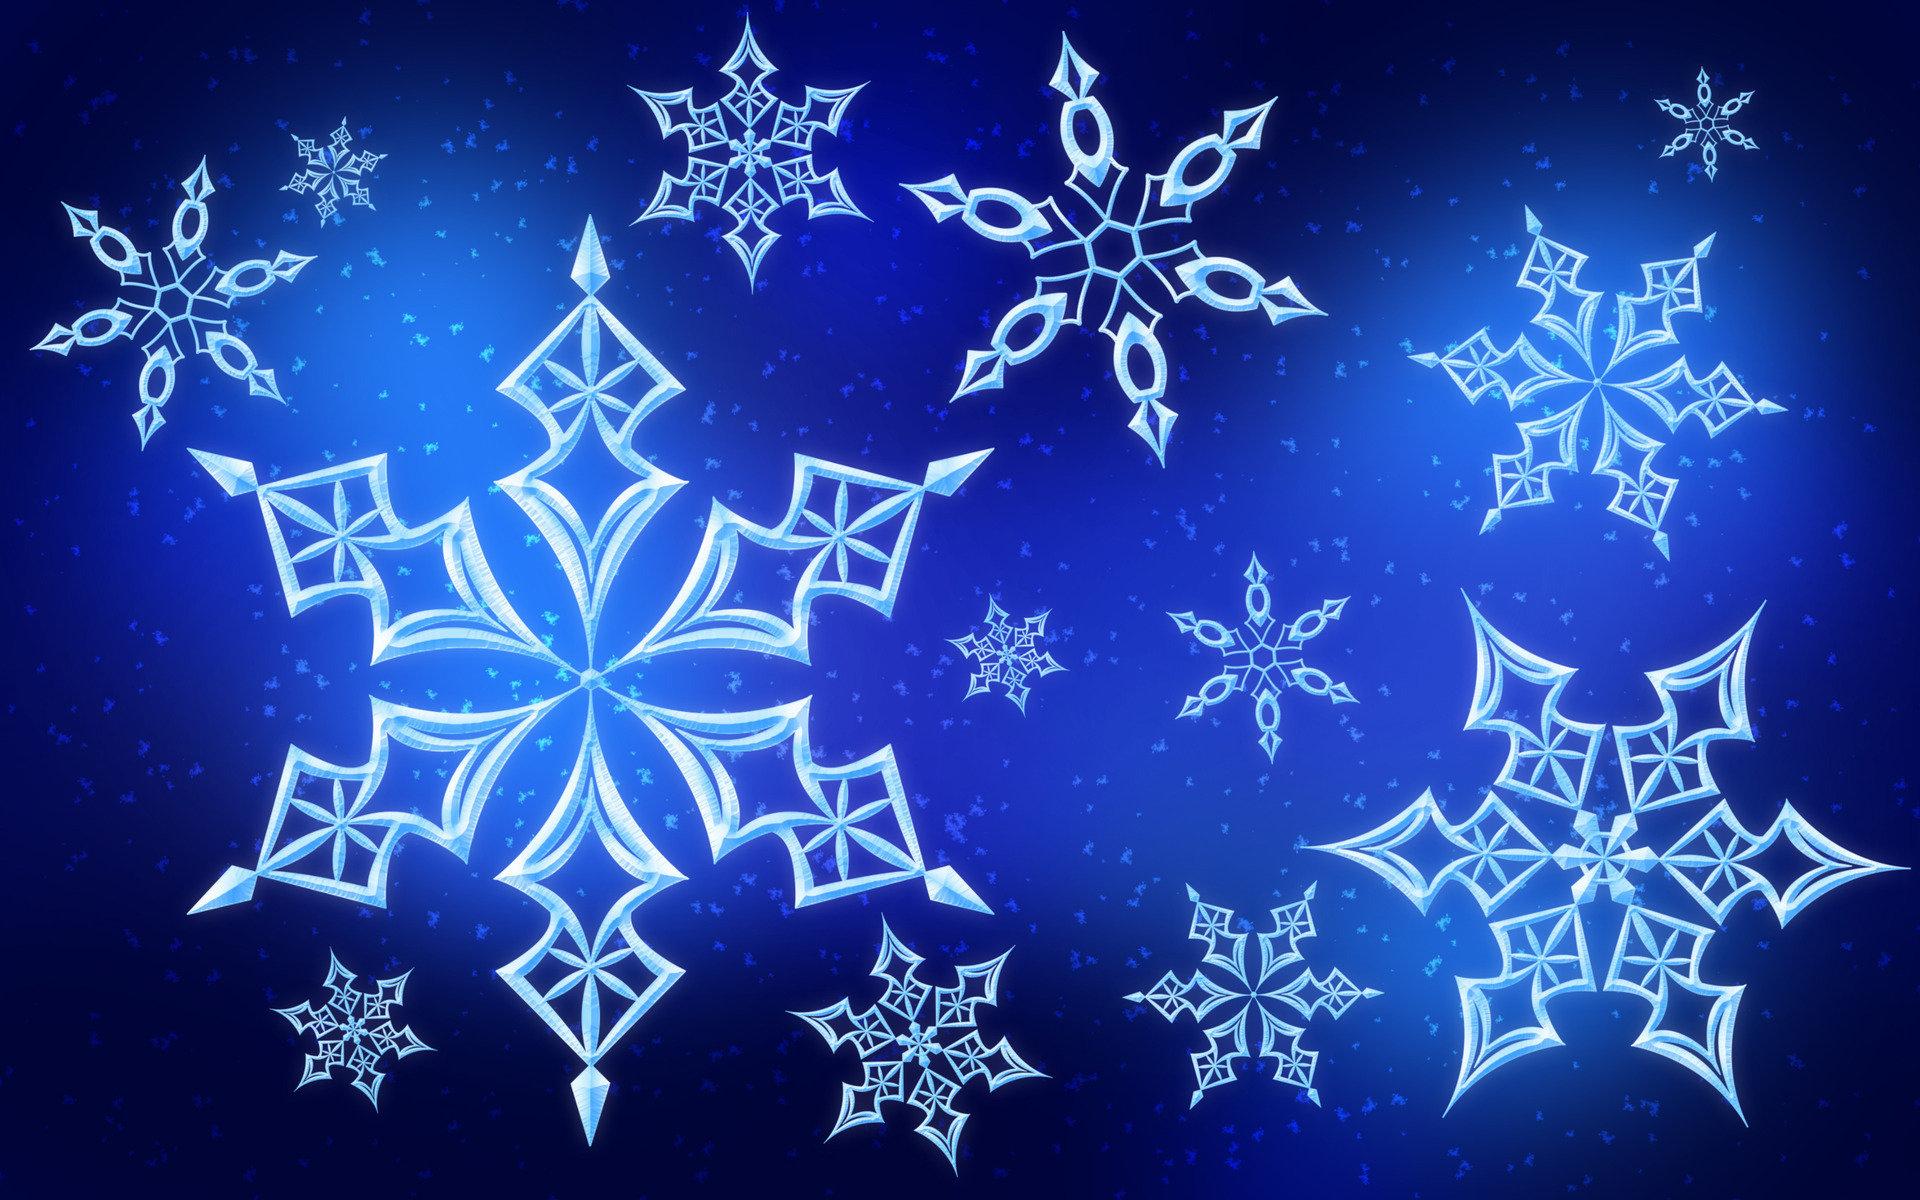 Download hd 1920x1200 snowflake desktop wallpaper id45401 for free voltagebd Gallery